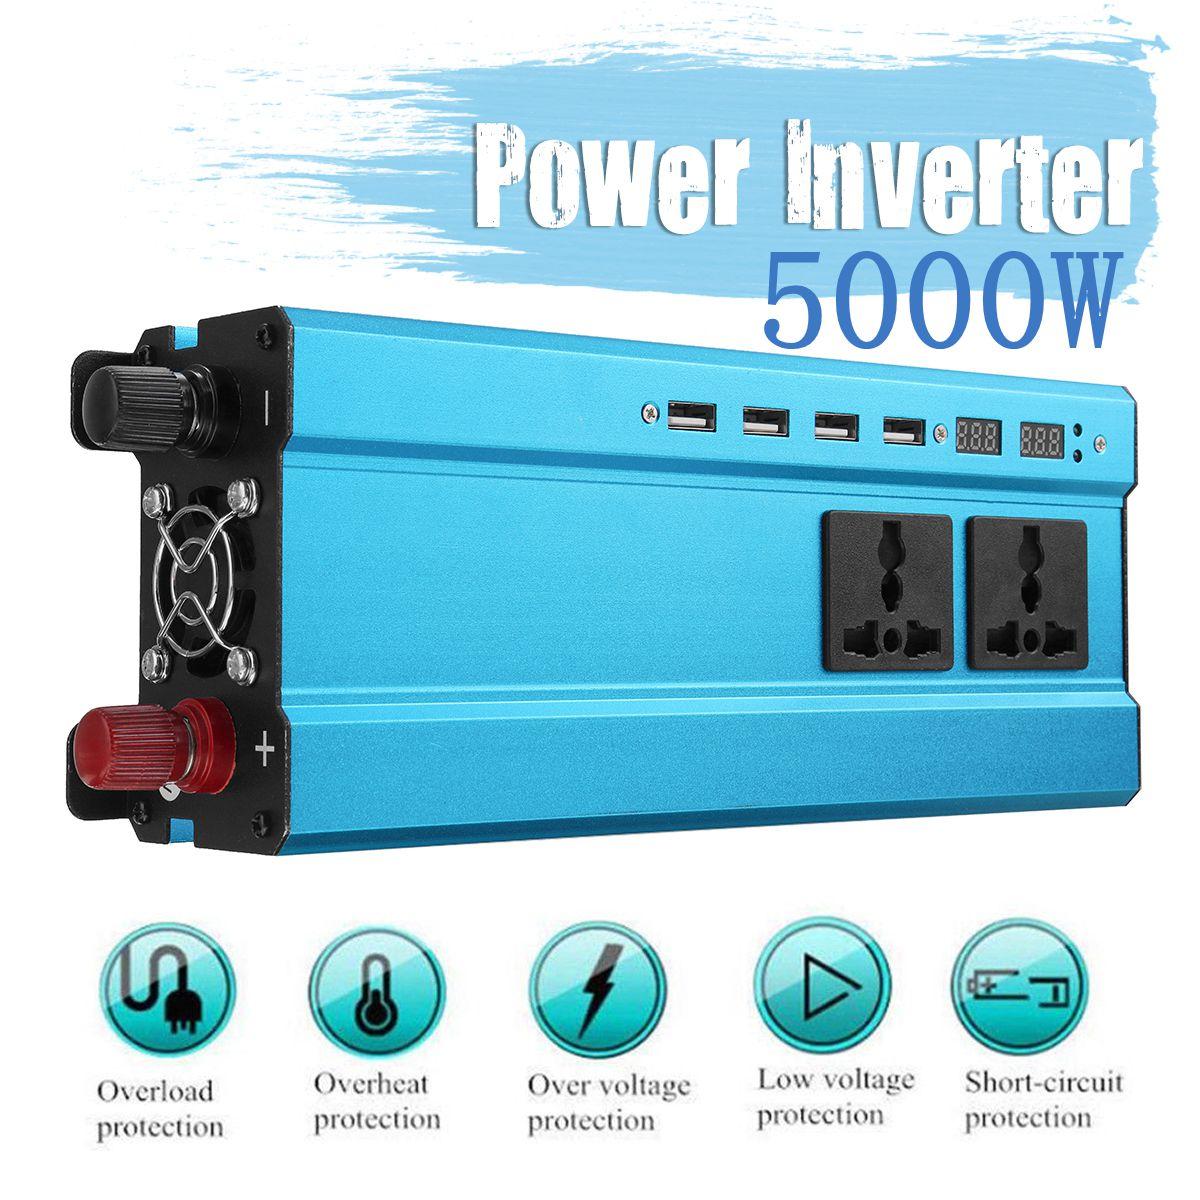 5000w conversor de carro inversor de energia